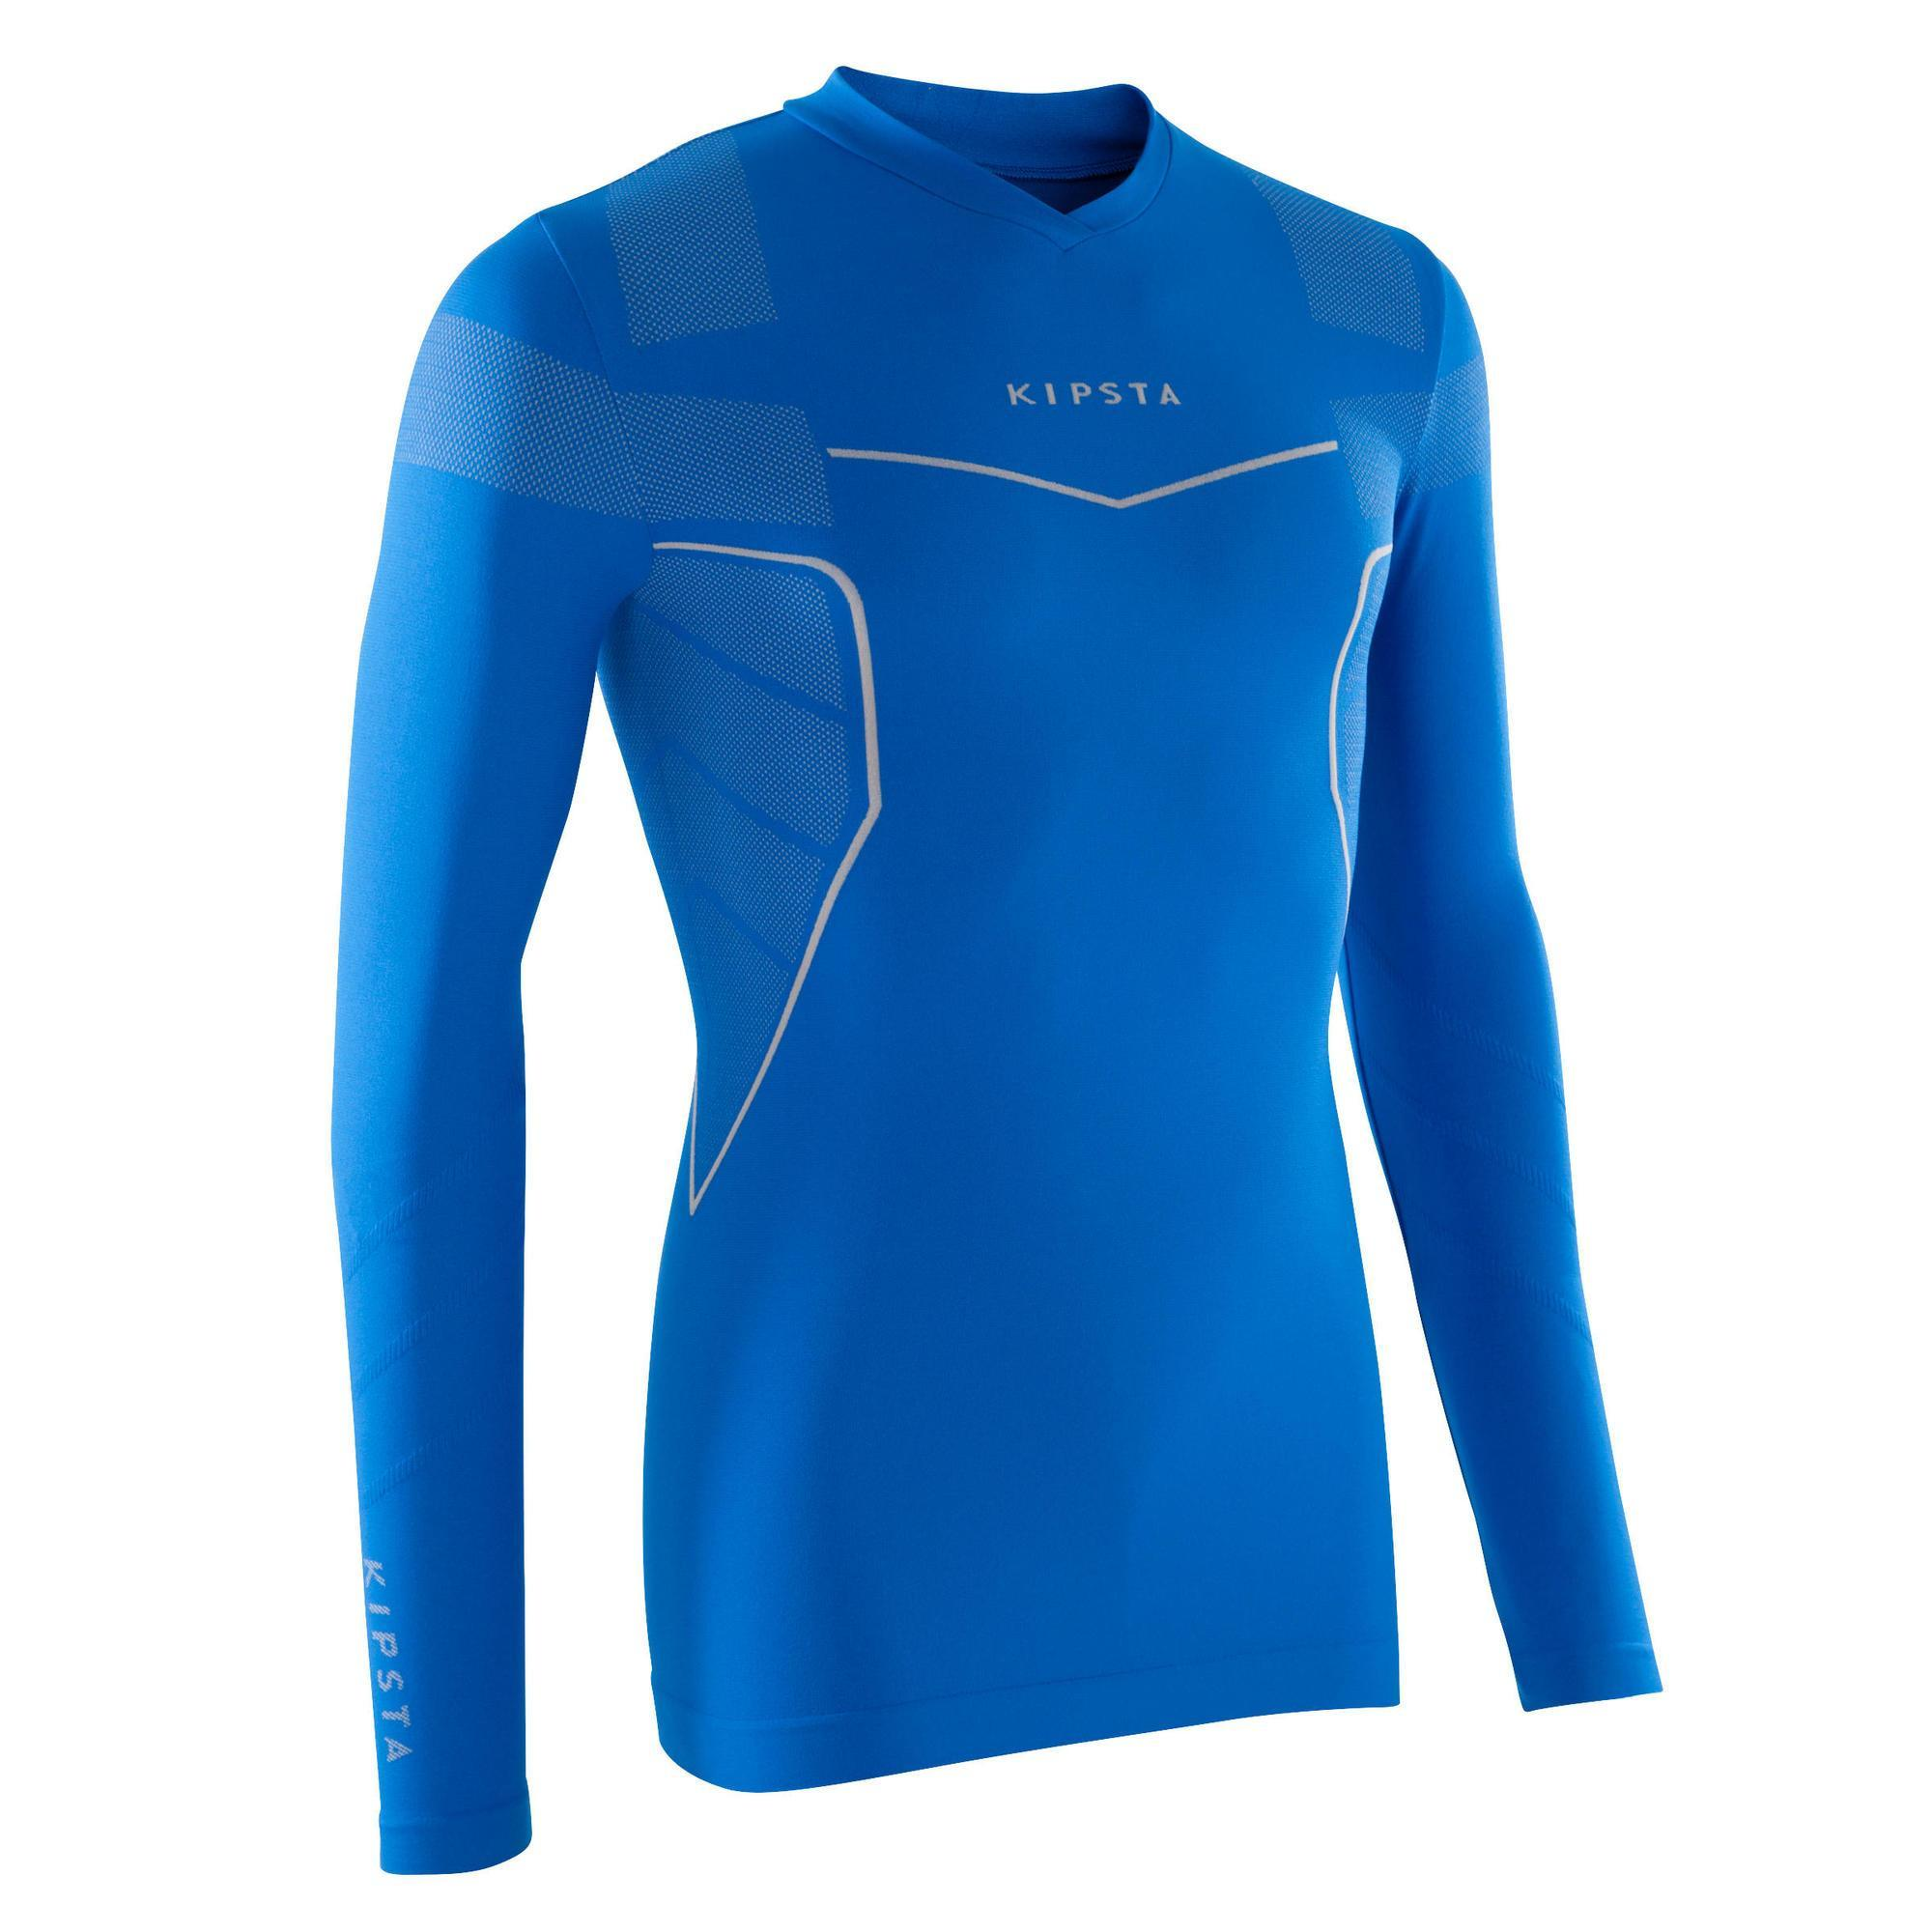 Funktionsshirt langarm Keepdry 500 atmungsaktiv Erwachsene blau | Sportbekleidung > Sportshirts > Funktionsshirts | Blau | Polyester - Polyamid | Kipsta